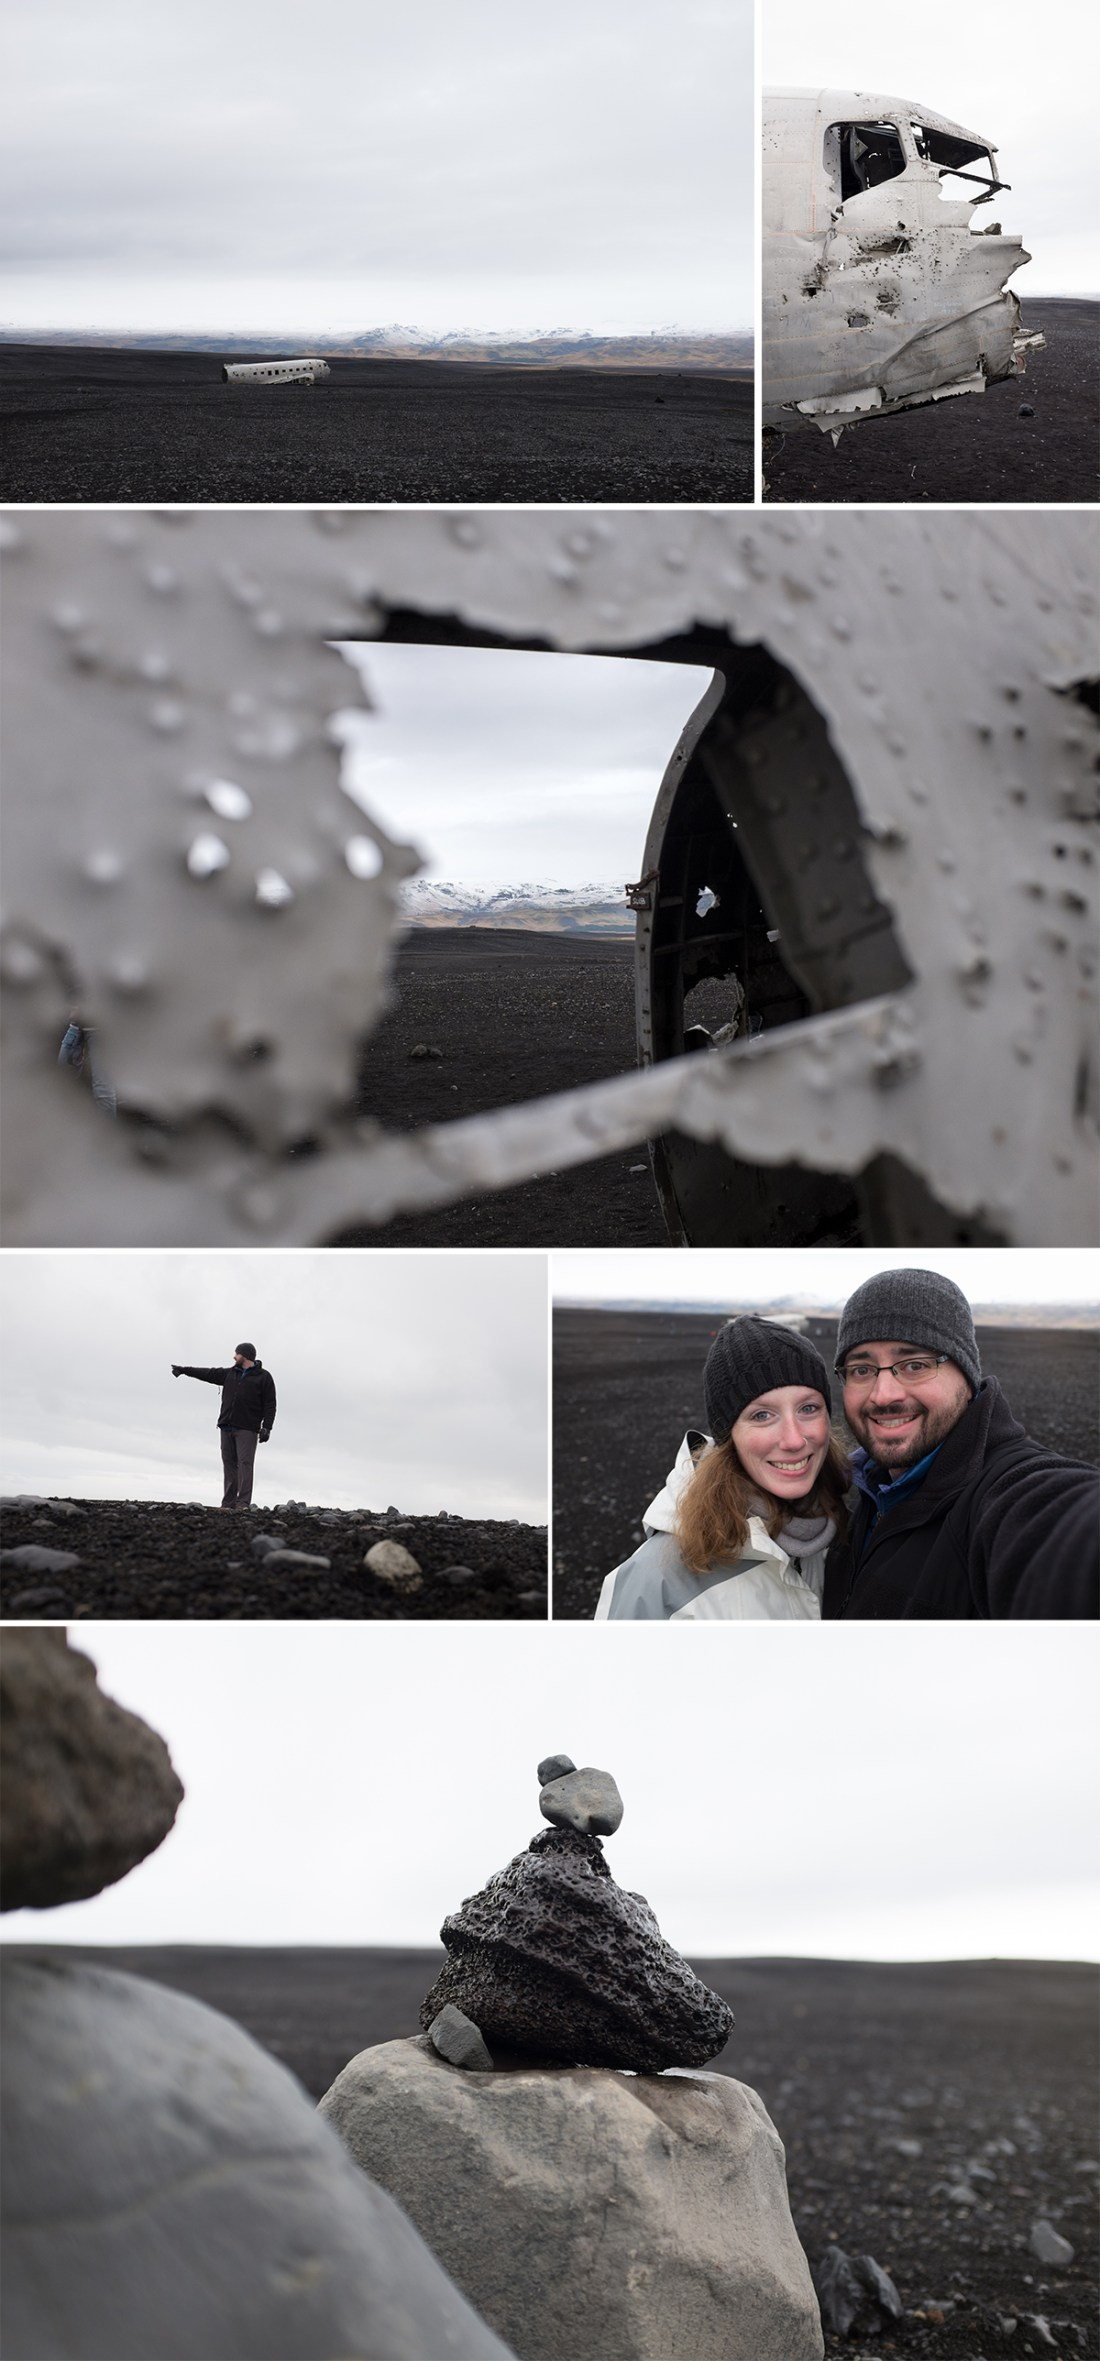 plane-crash-site